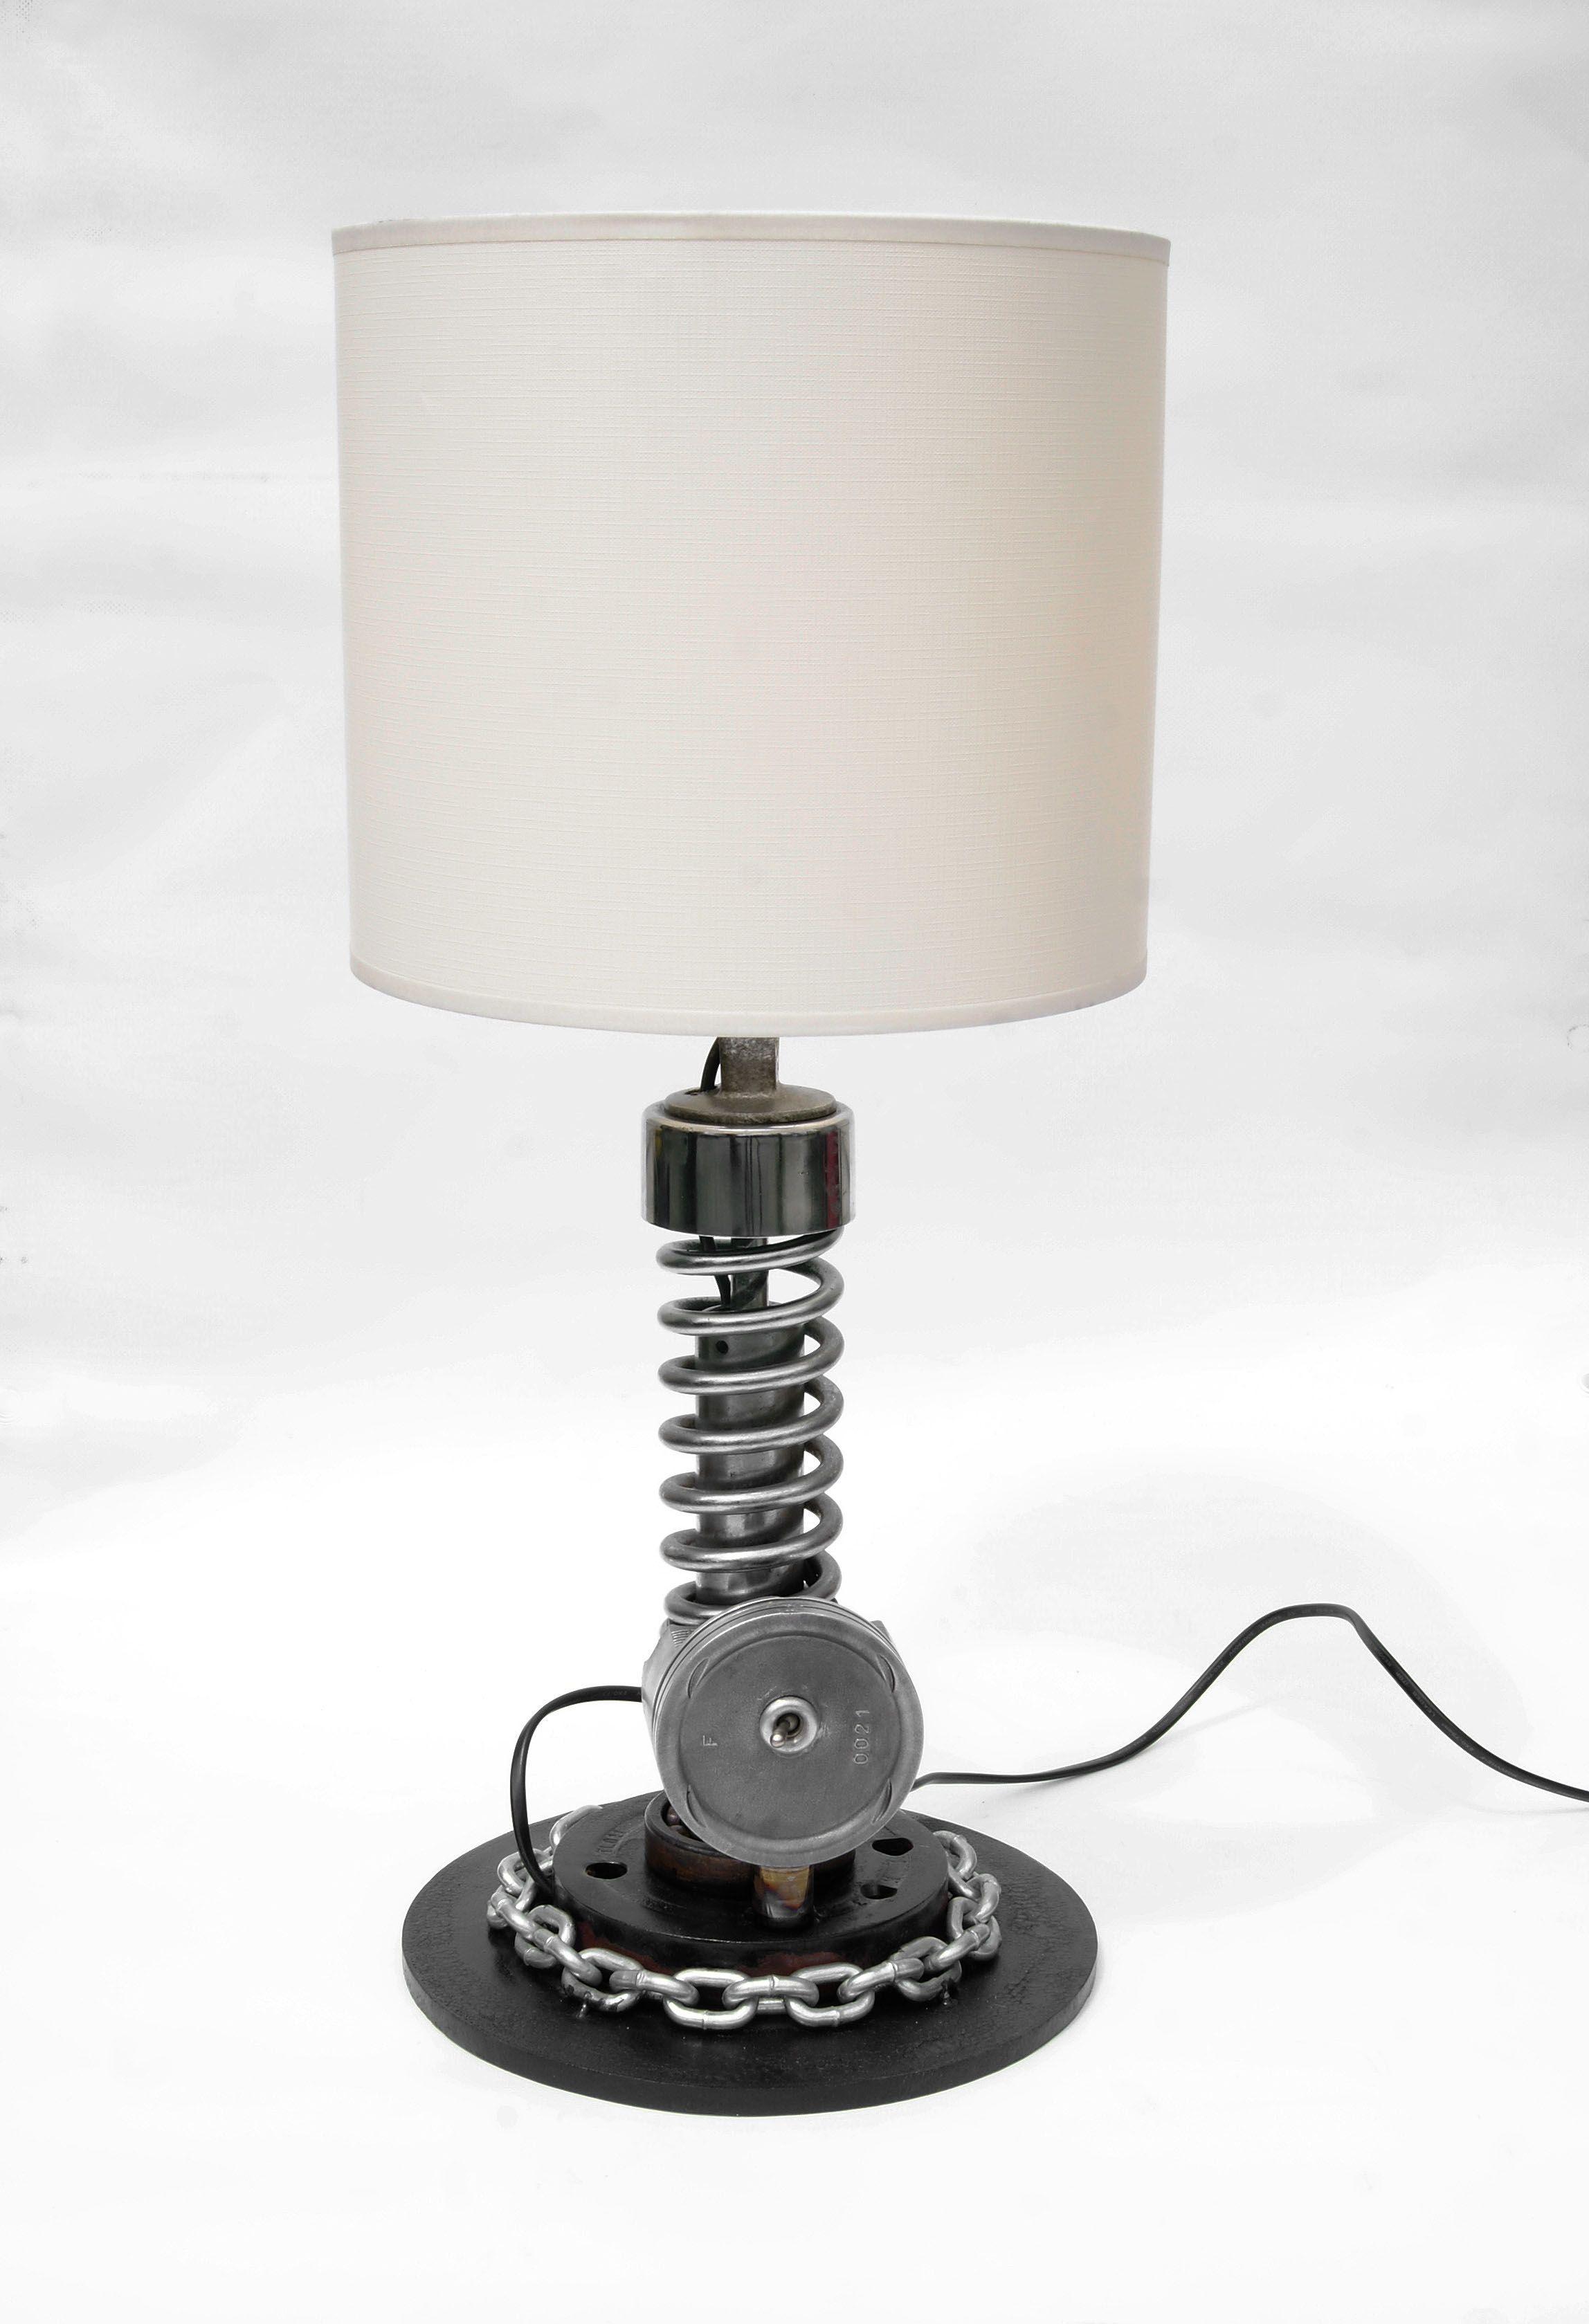 Desktop lamp by RUSTWELD shock absorber version SOLD